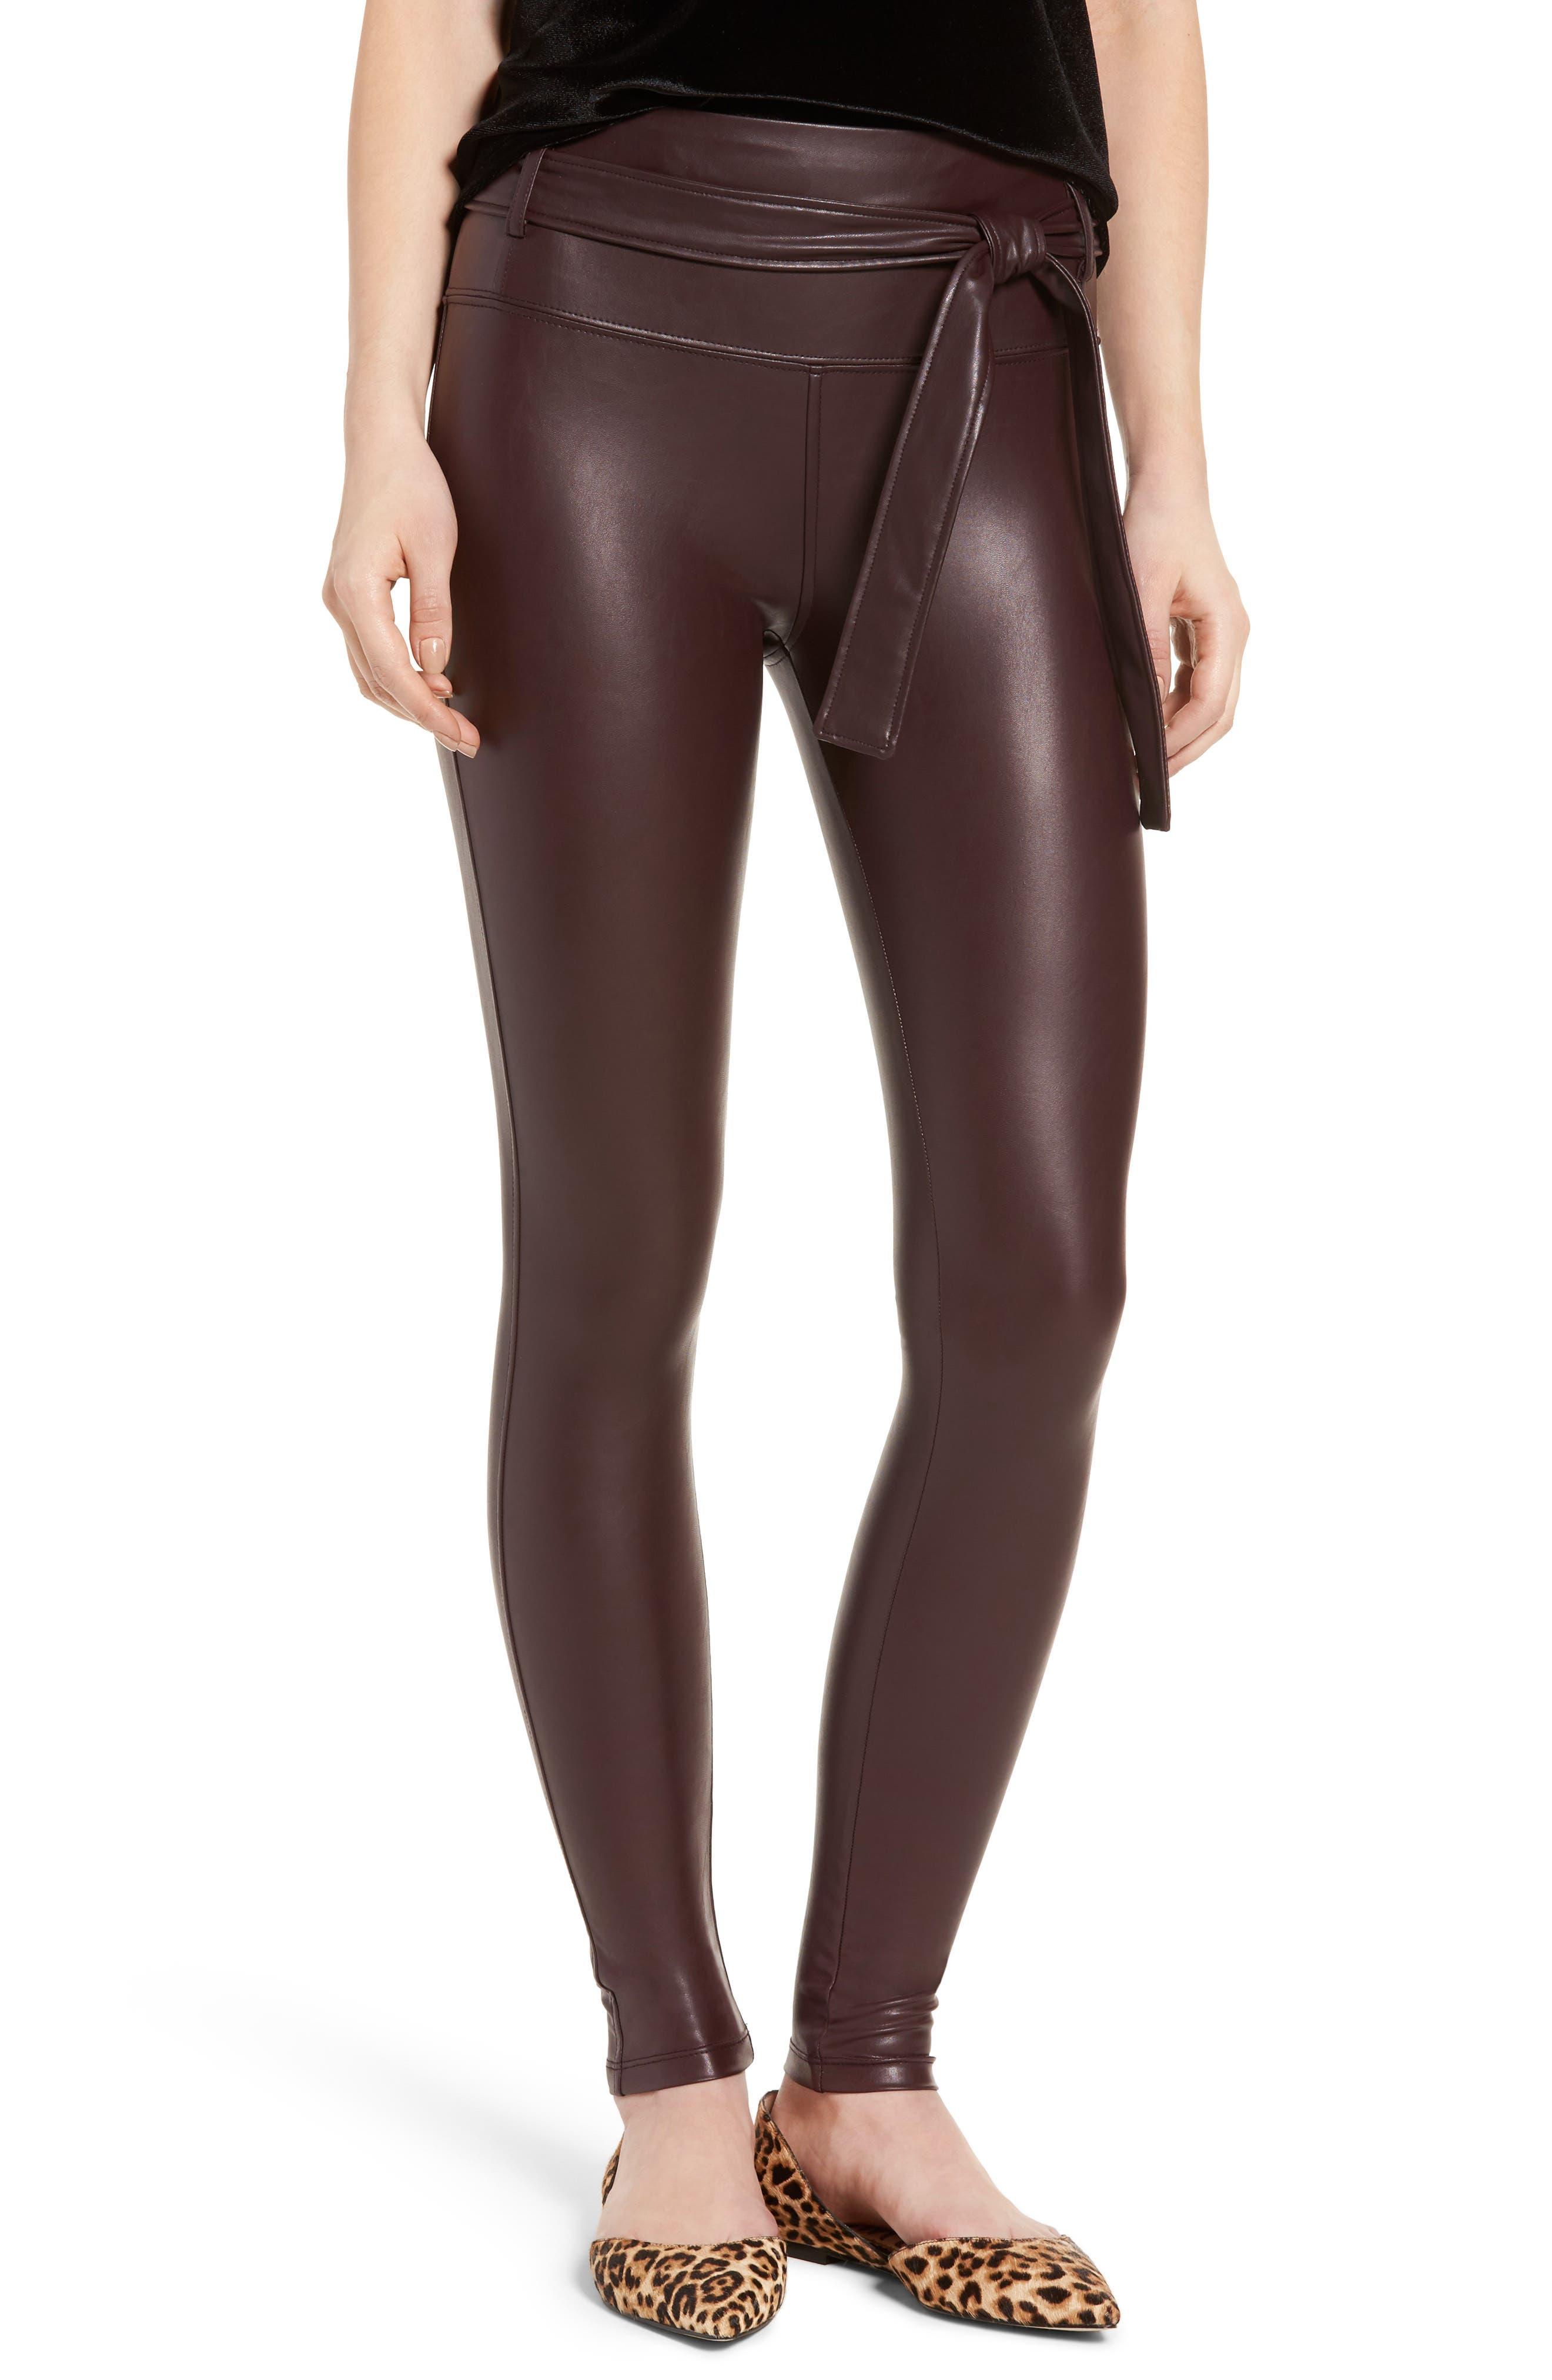 Alternate Image 1 Selected - David Lerner Elliot High Waist Faux Leather Leggings